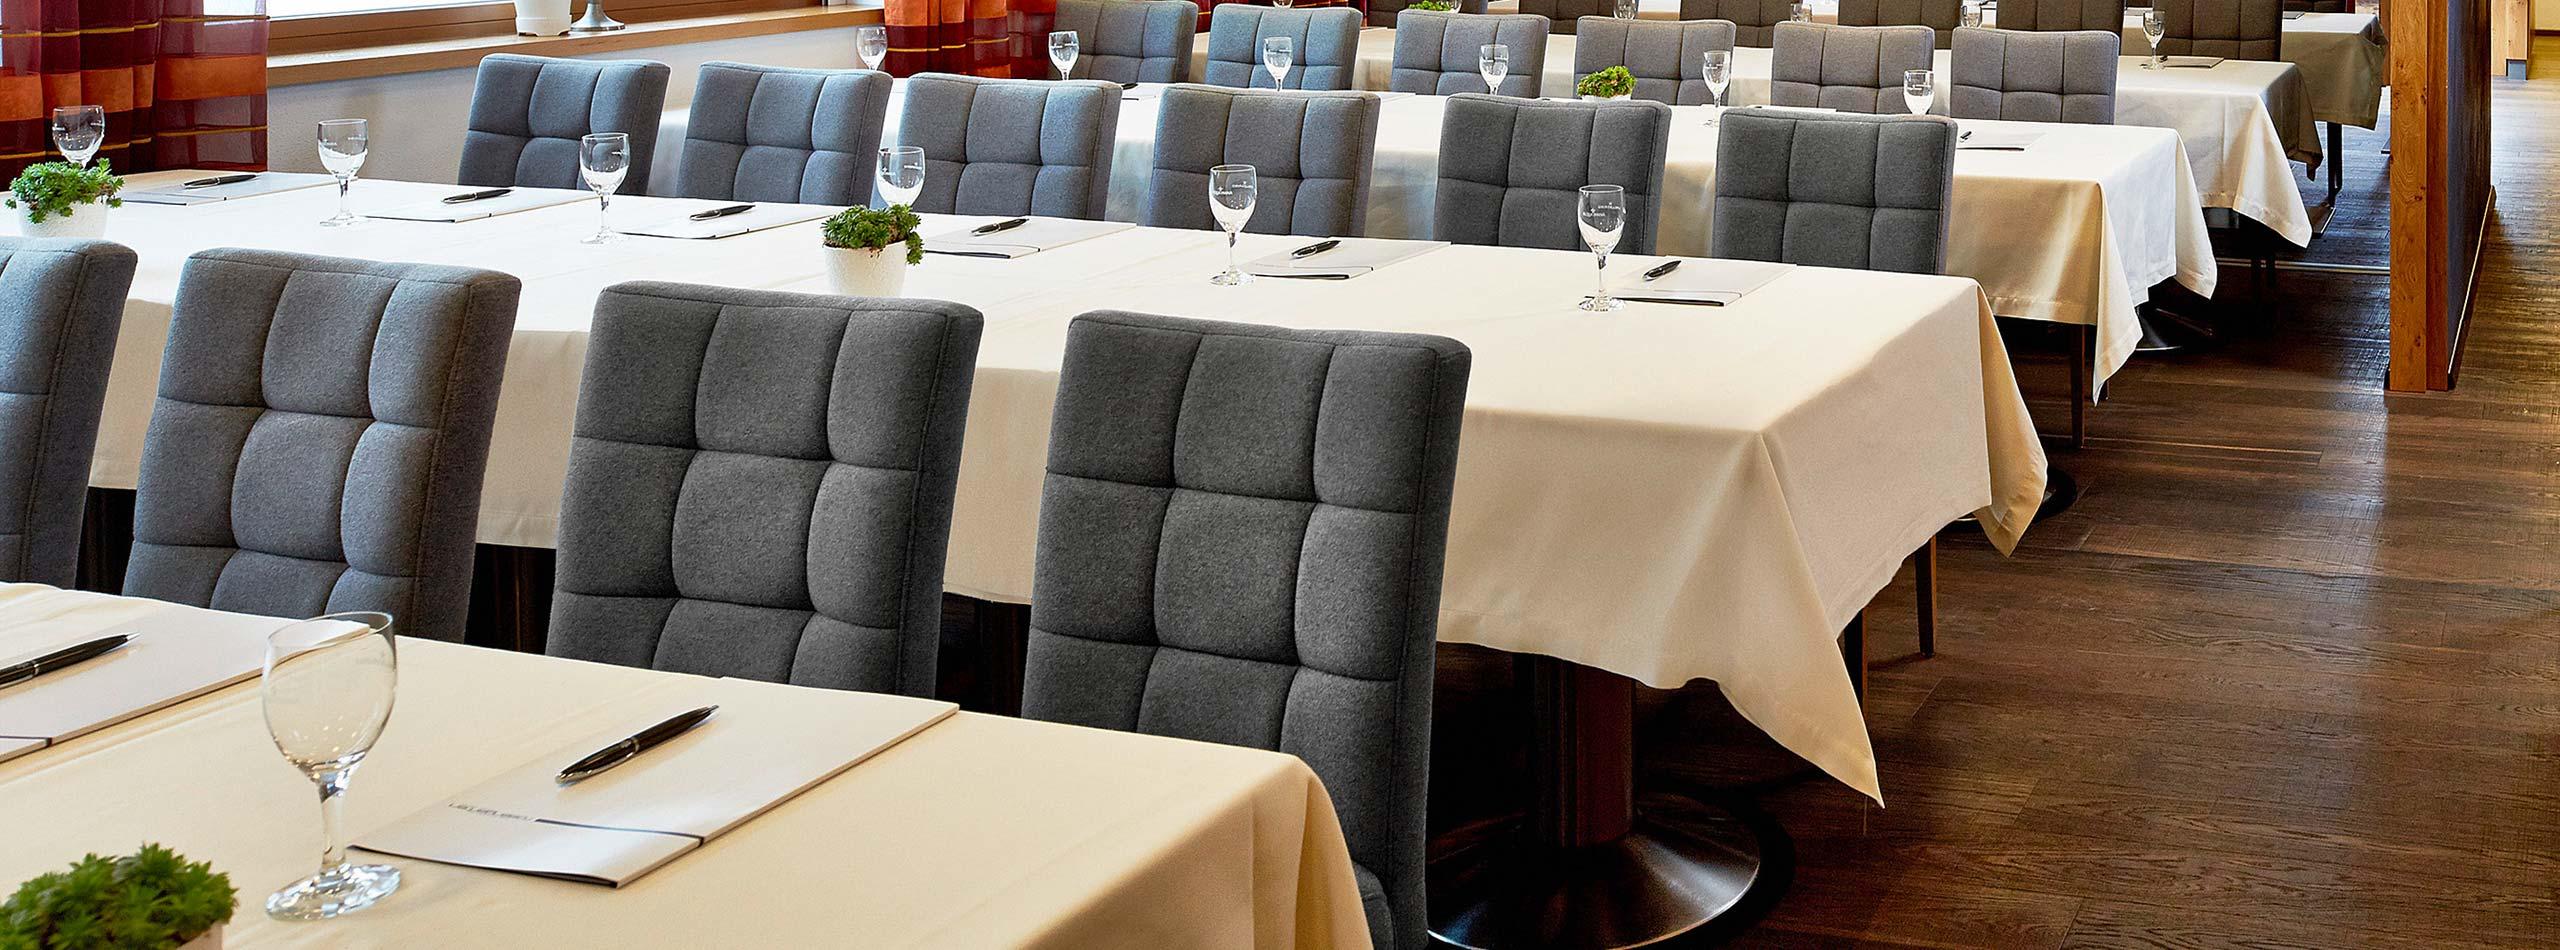 Meetings & seminars 5-star hotel in Kirchberg Rosengarten Tyrol Austria